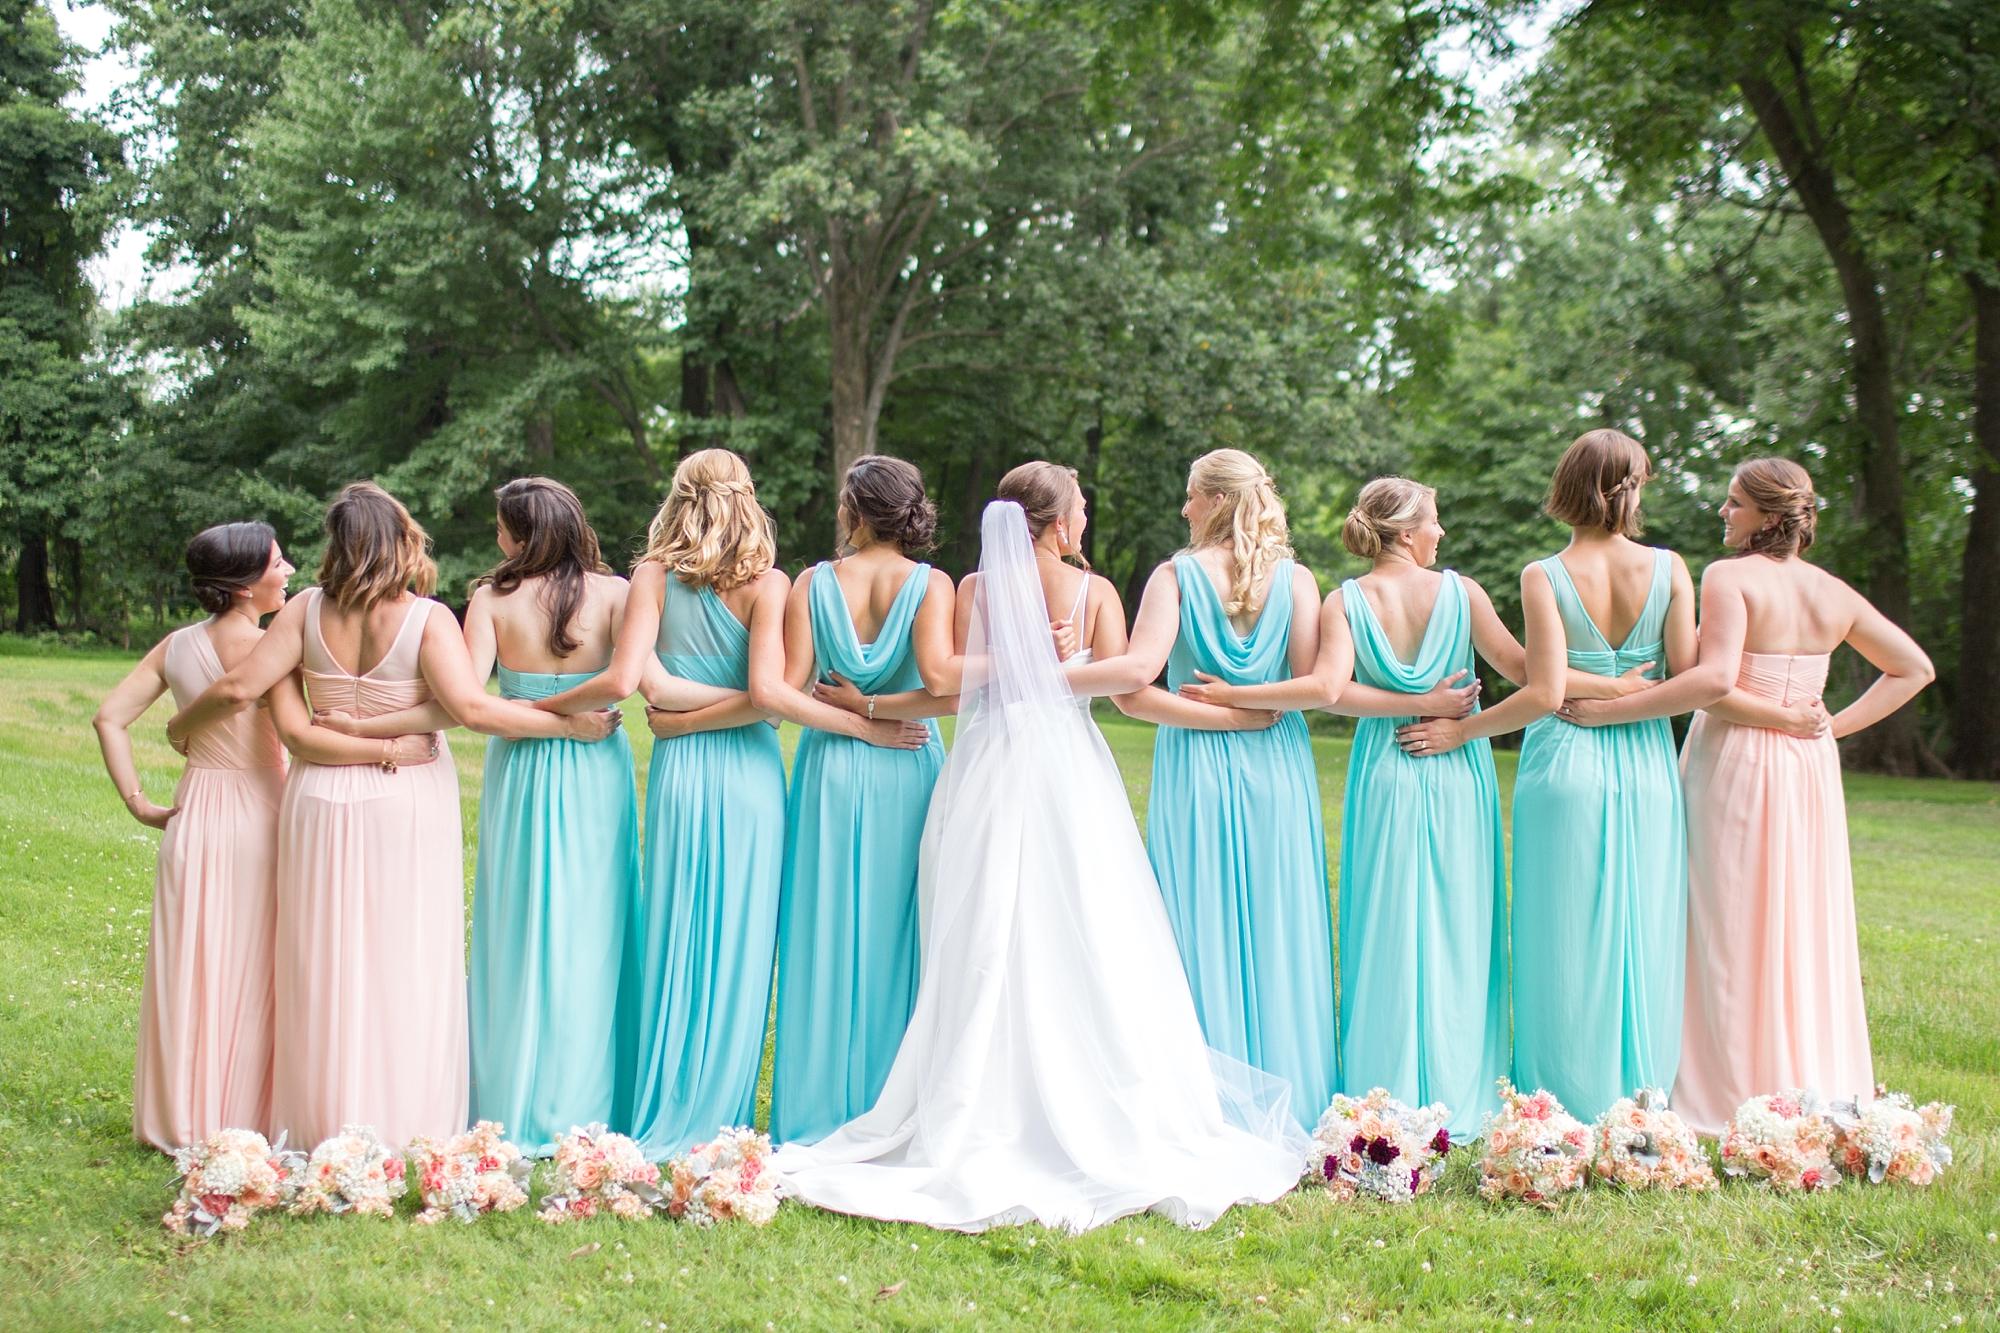 Russell 2-Bridal Party-368_anna grace photography baltimore maryland wedding photographer elkridge furnace inn wedding photo.jpg